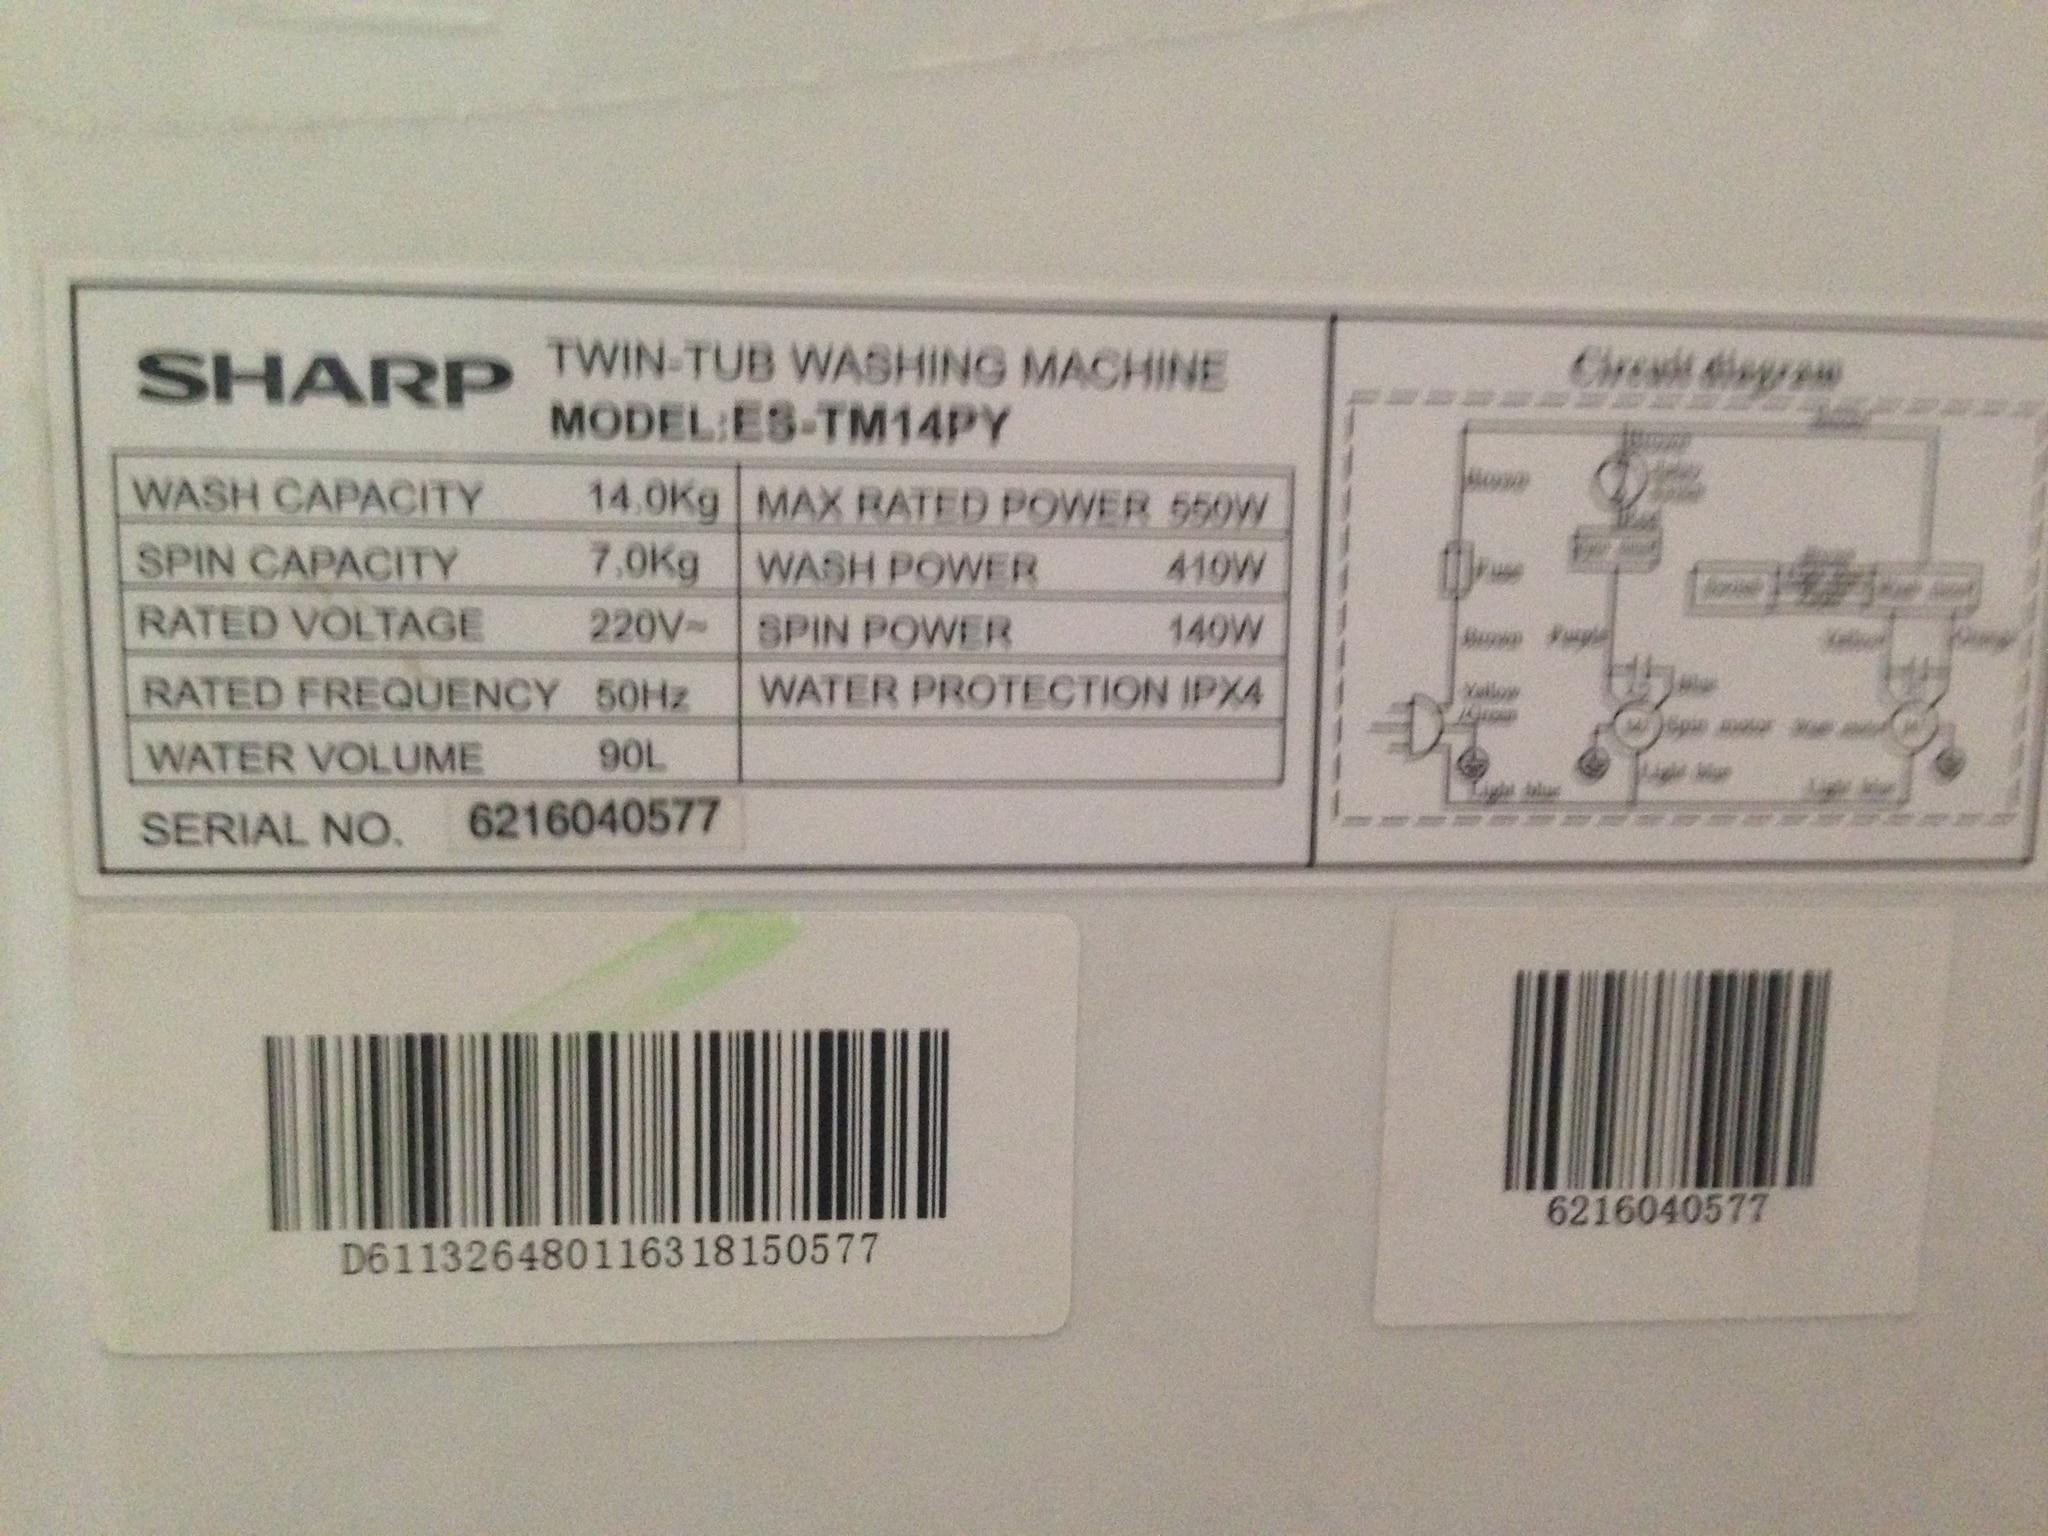 Jual Mesin Cuci Sharp 2 Tabung 14 Kg ES TM14PY